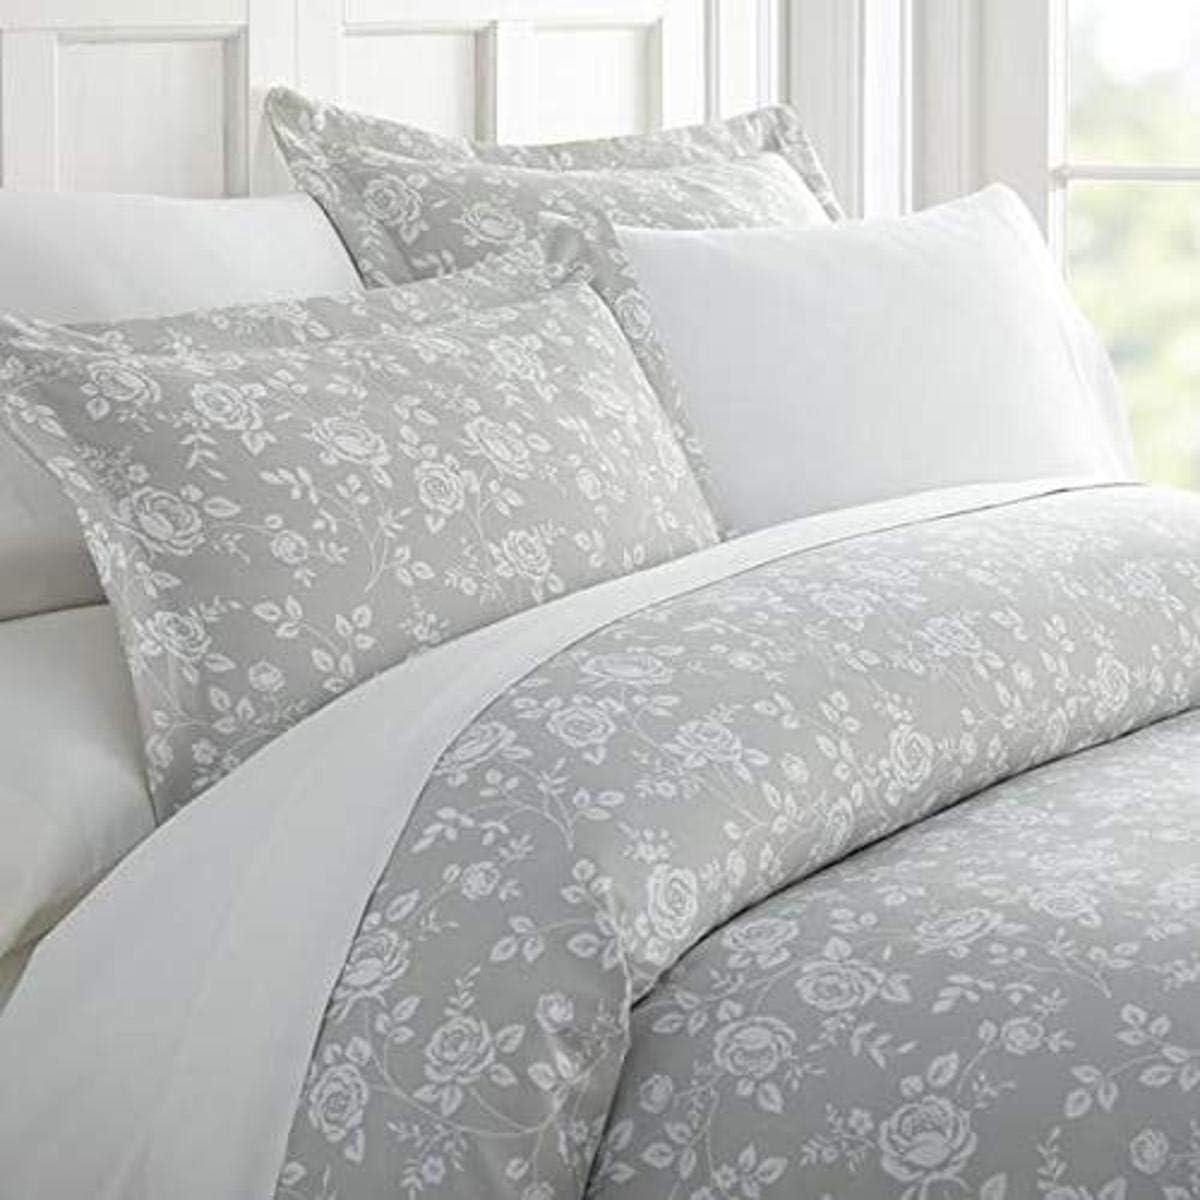 Linen Market Bargain gift sale iEnjoy Home Hotel Ultra Premium Collection Ros Soft